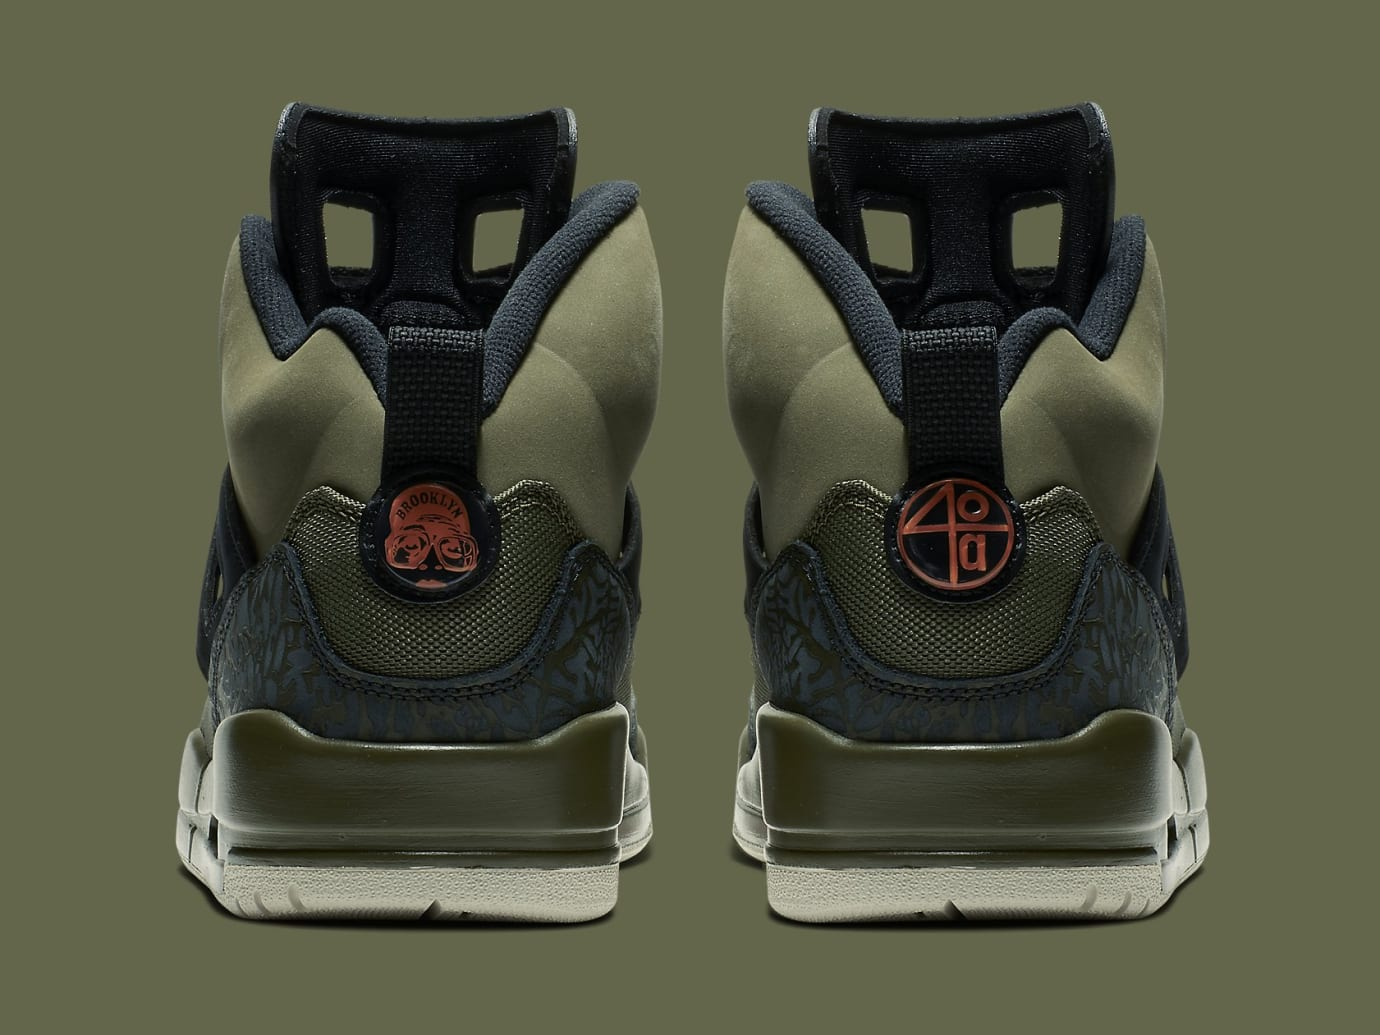 Jordan Spizike Undefeated Olive Green Release Date 315371-300 Heel